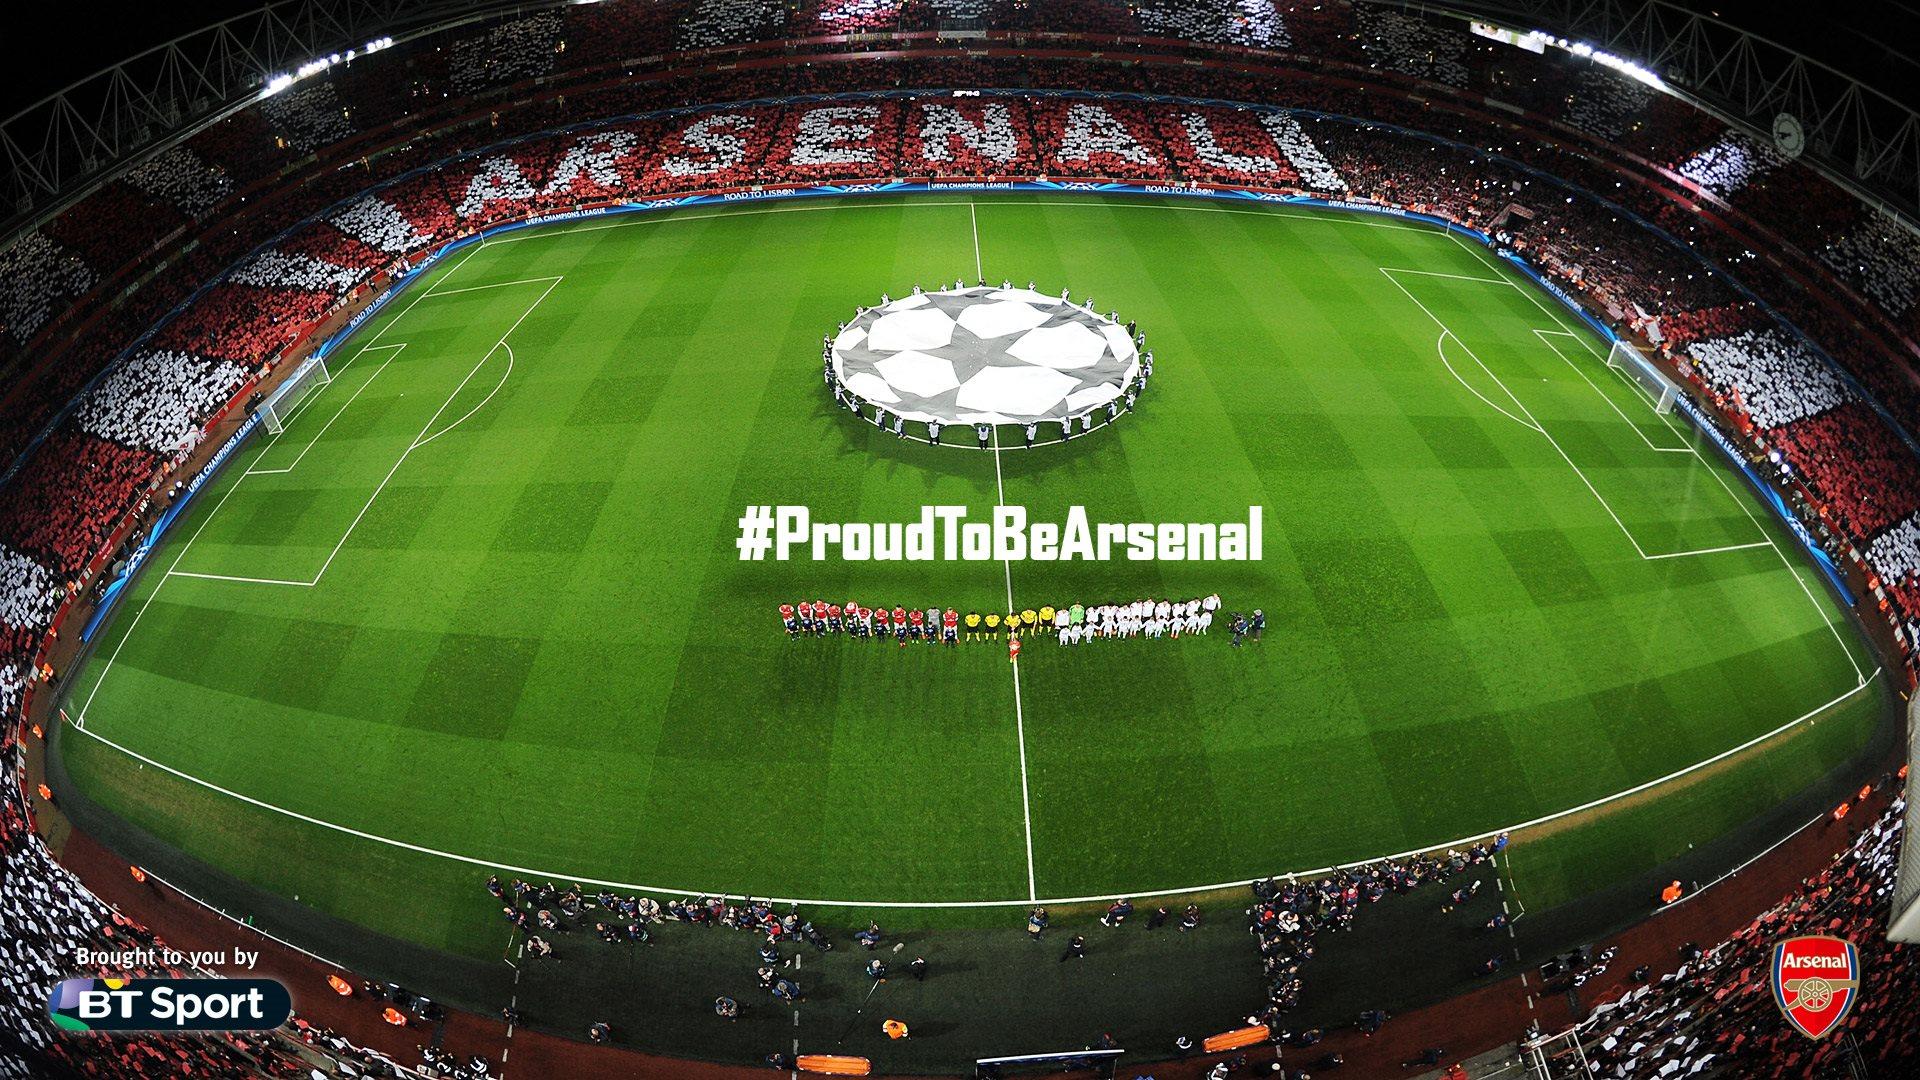 Arsenal Football Club Wallpapers HD Wallpapers 1920x1080